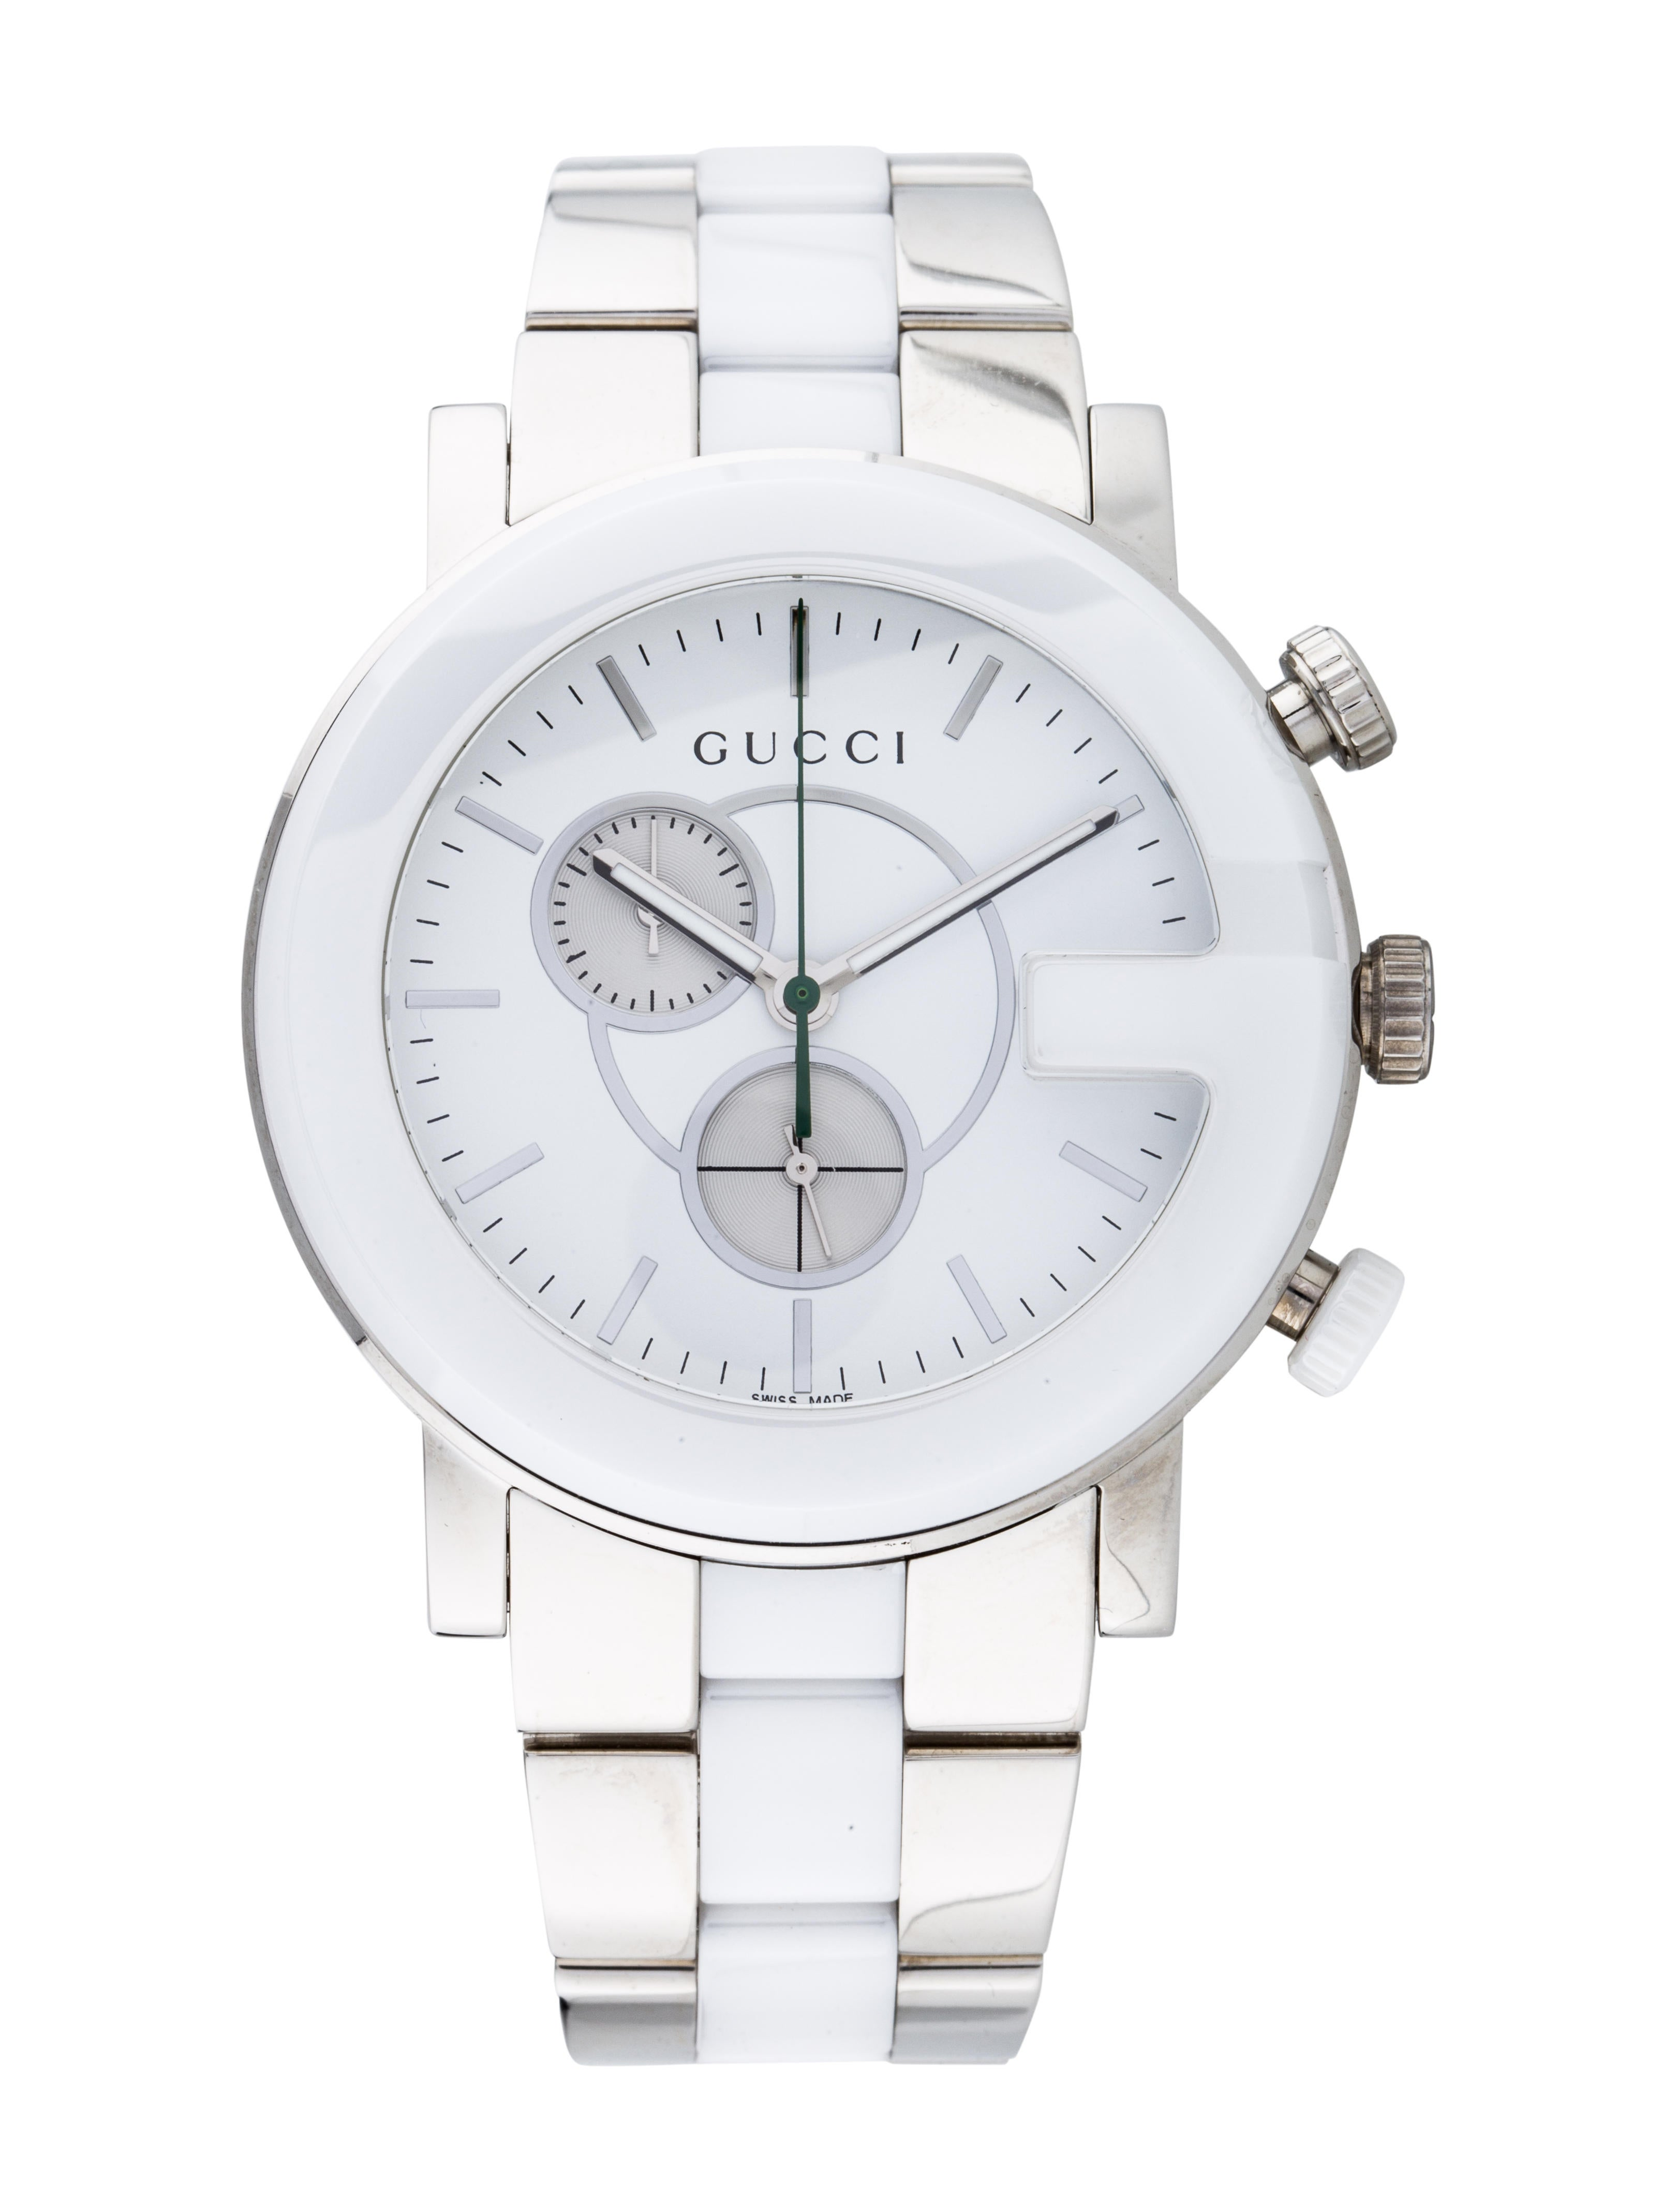 13332a2cb86 Gucci G-Chrono Watch - Bracelet - GUC235734